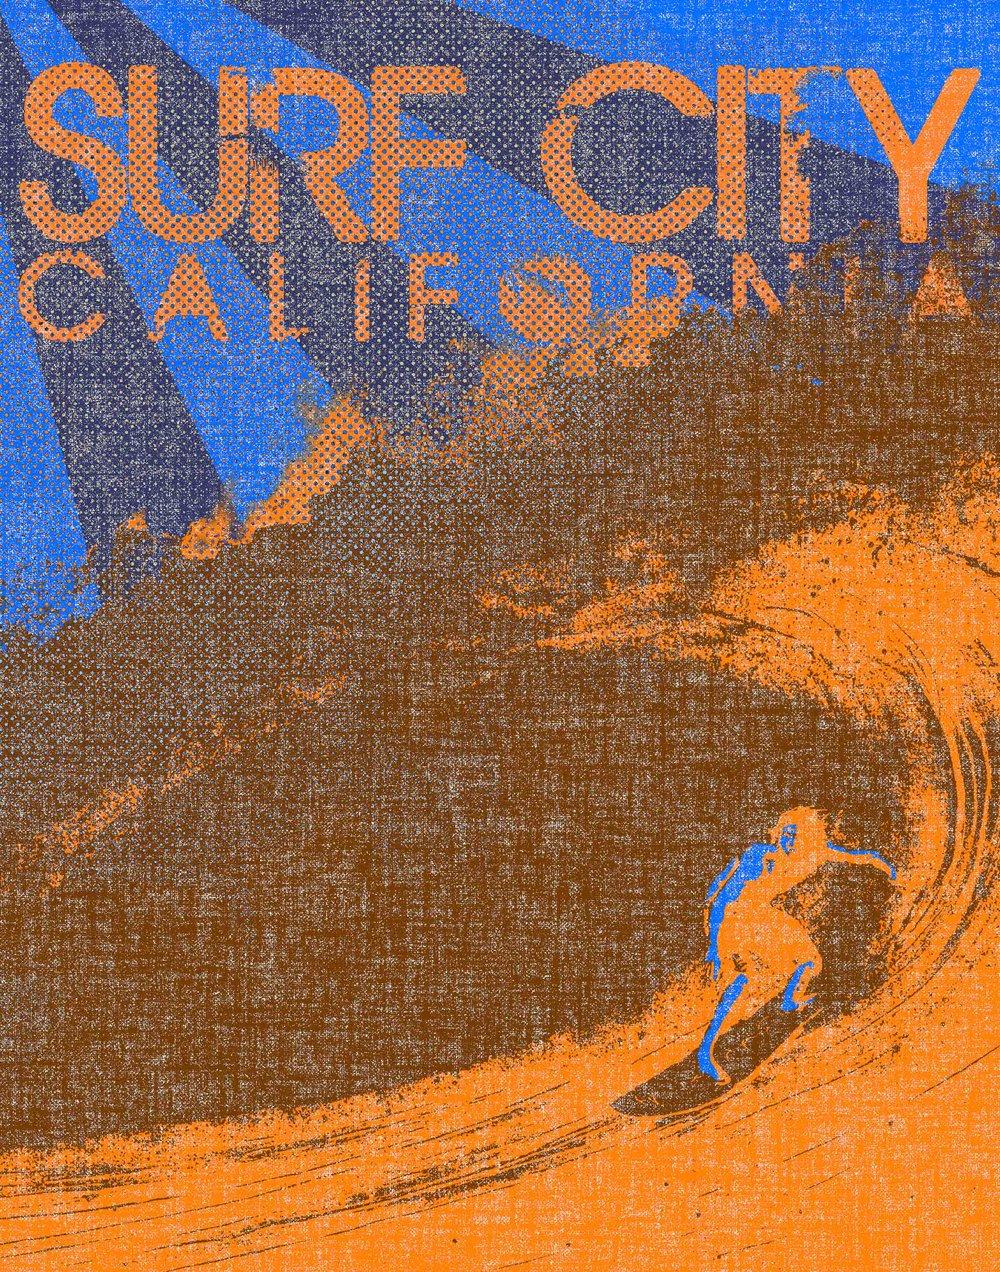 Surf City, CA 1